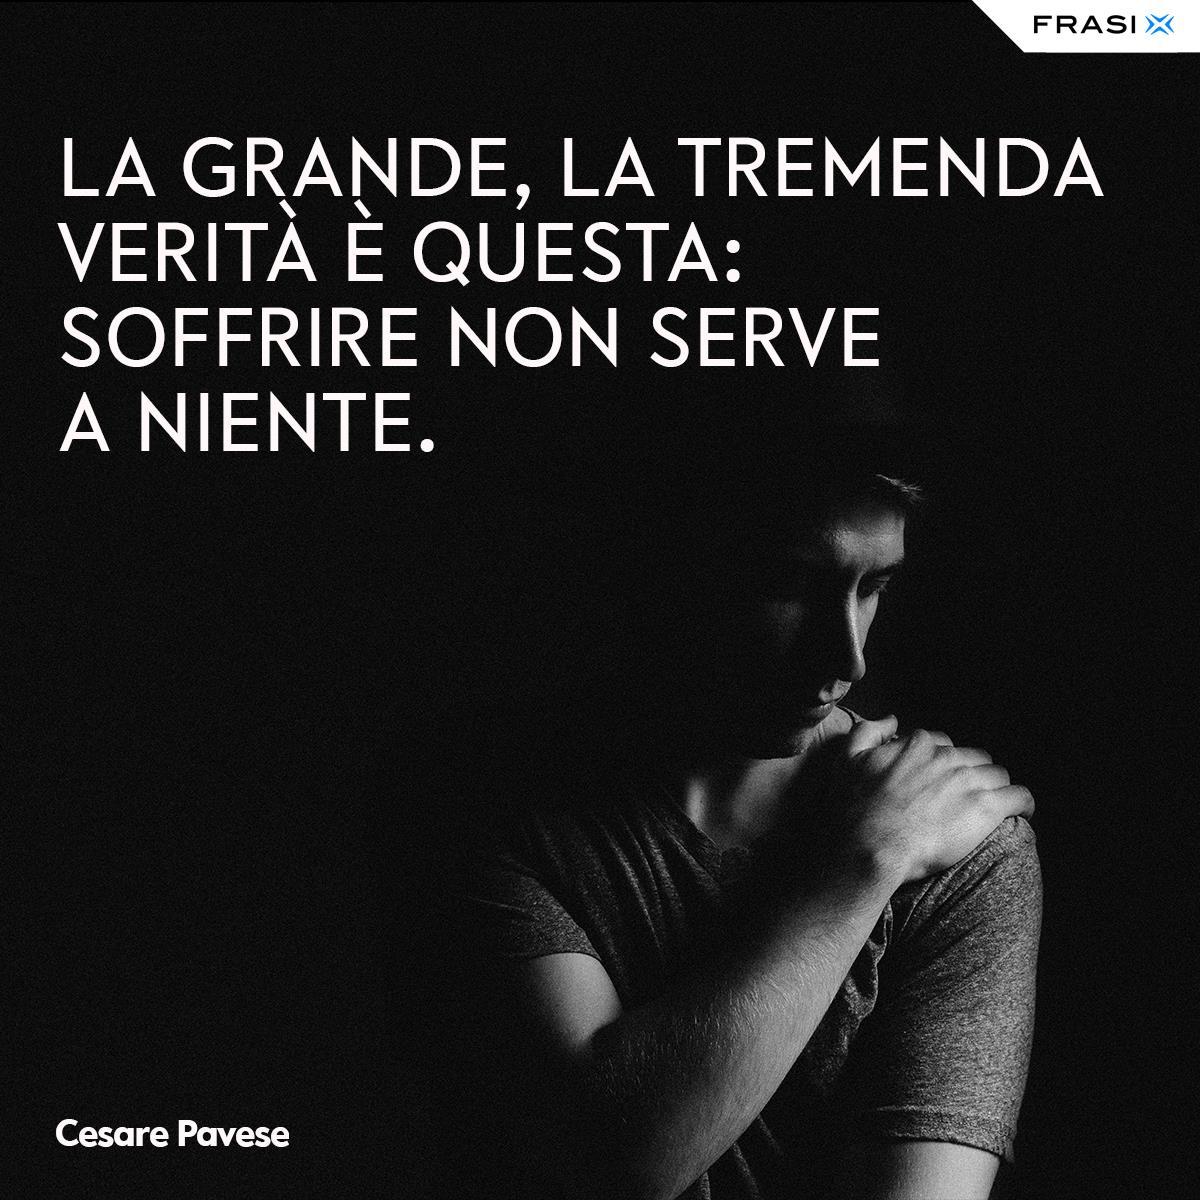 Frasi depresse e tristi Cesare Pavese